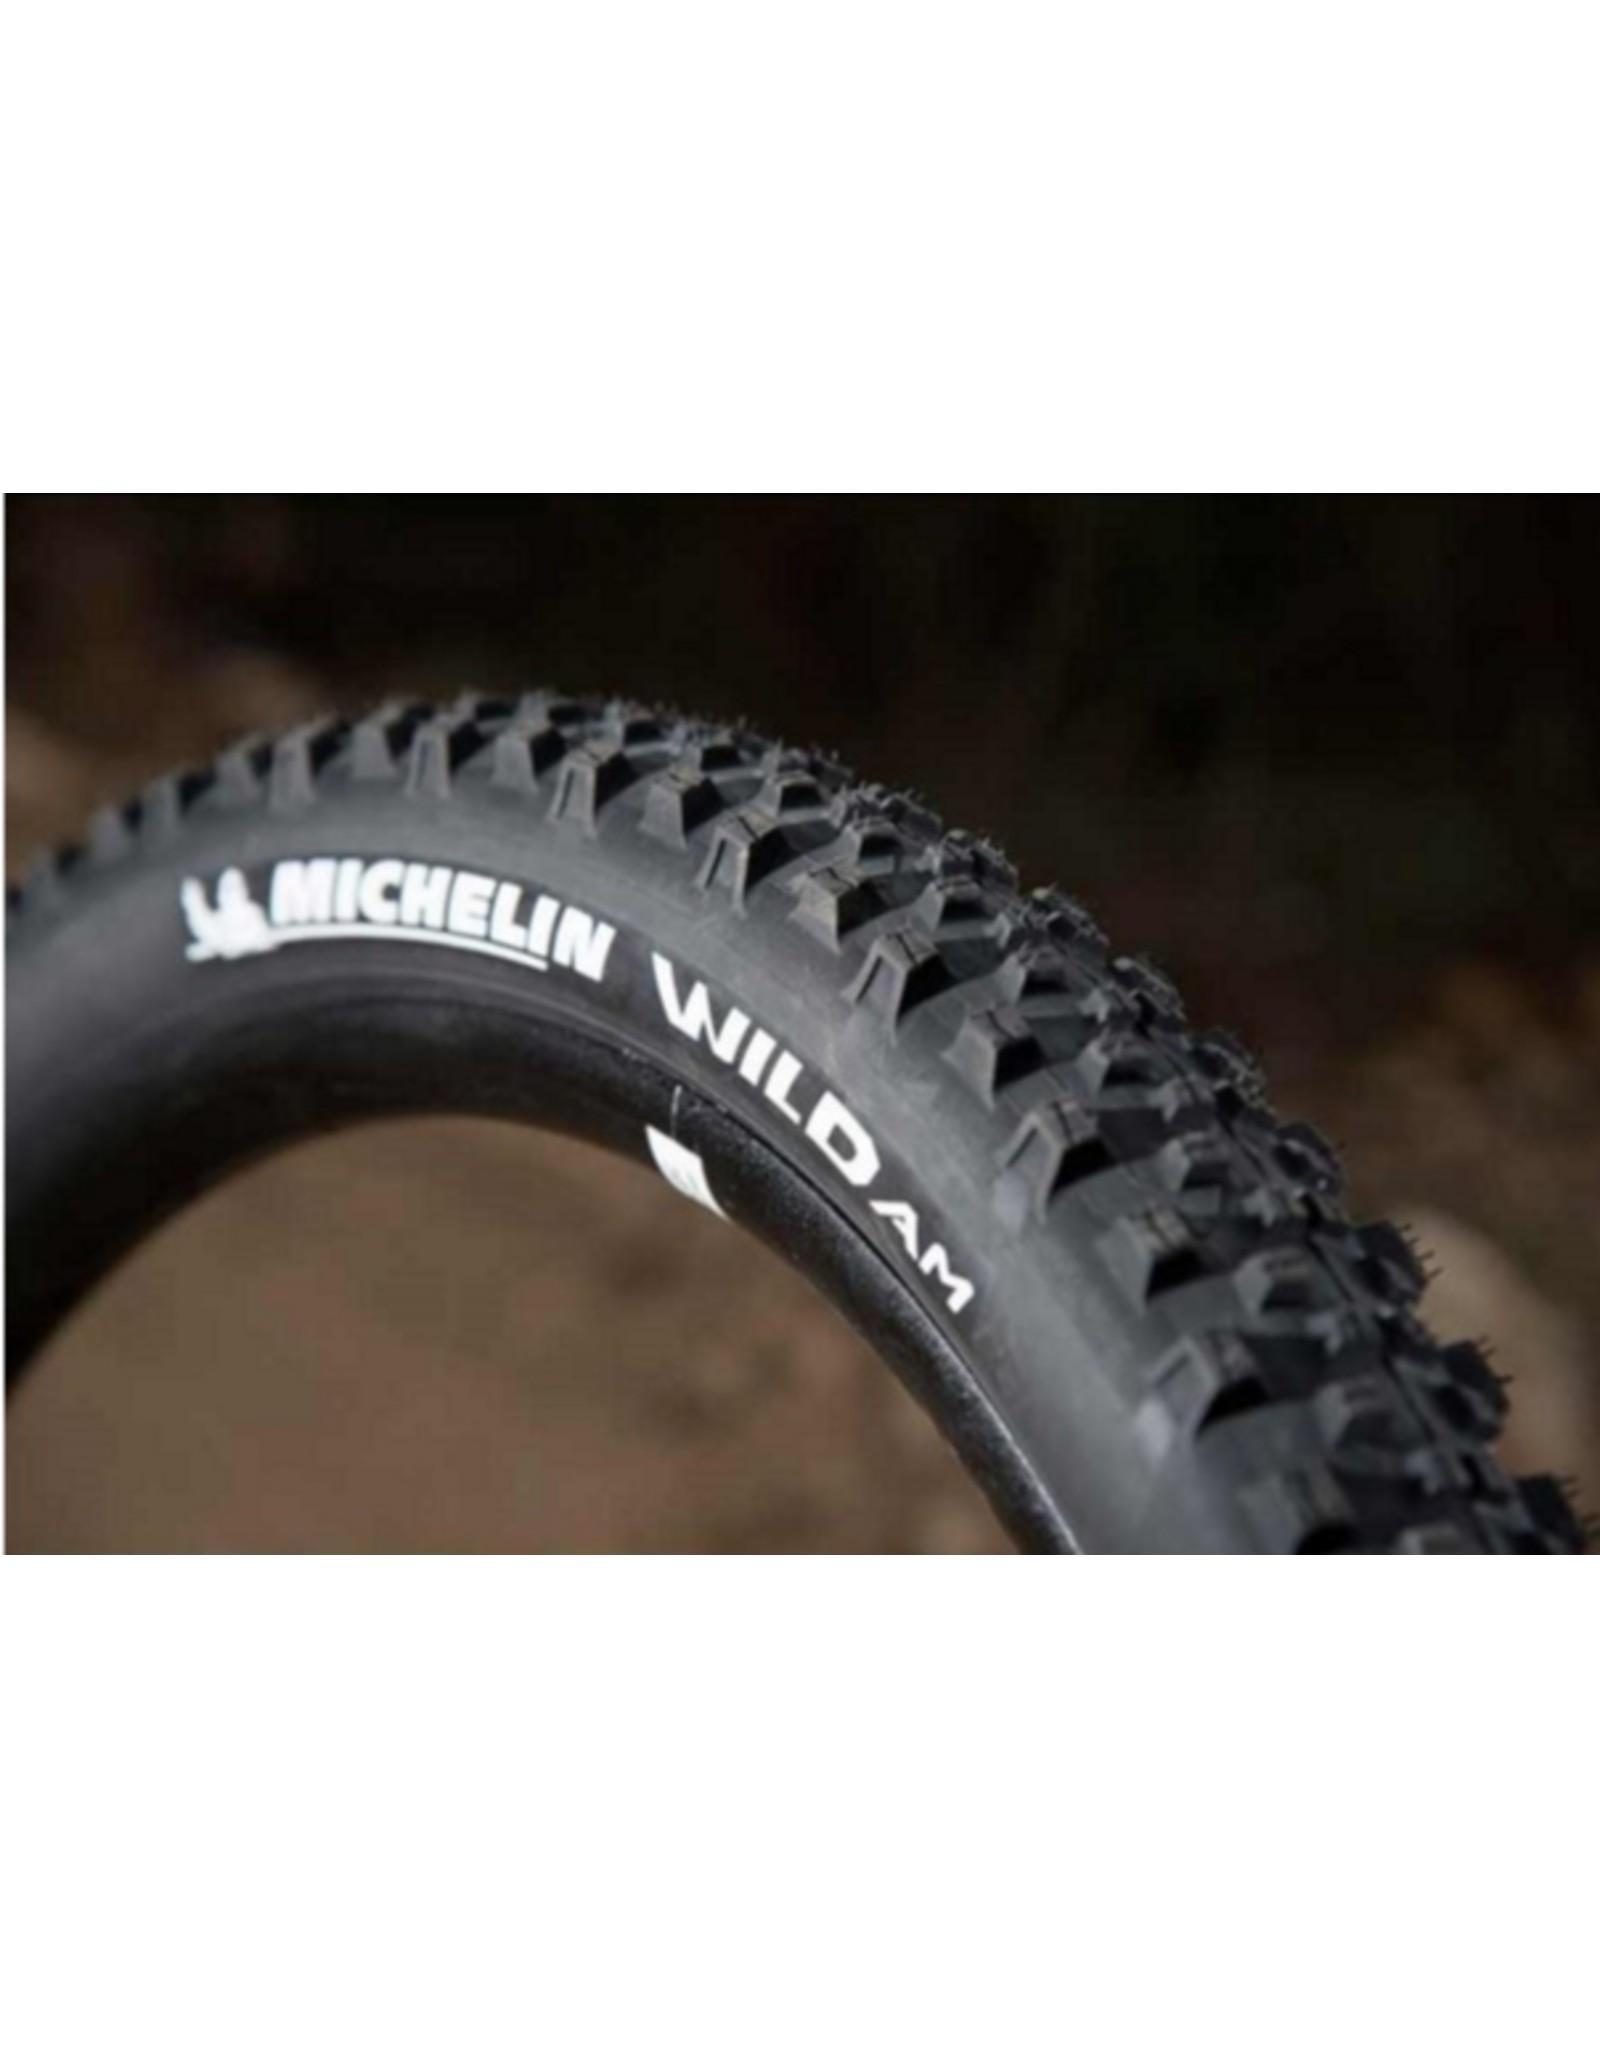 Michelin, Wild AM, 27.5''x2.35, Pliable, GUM-X, Noir